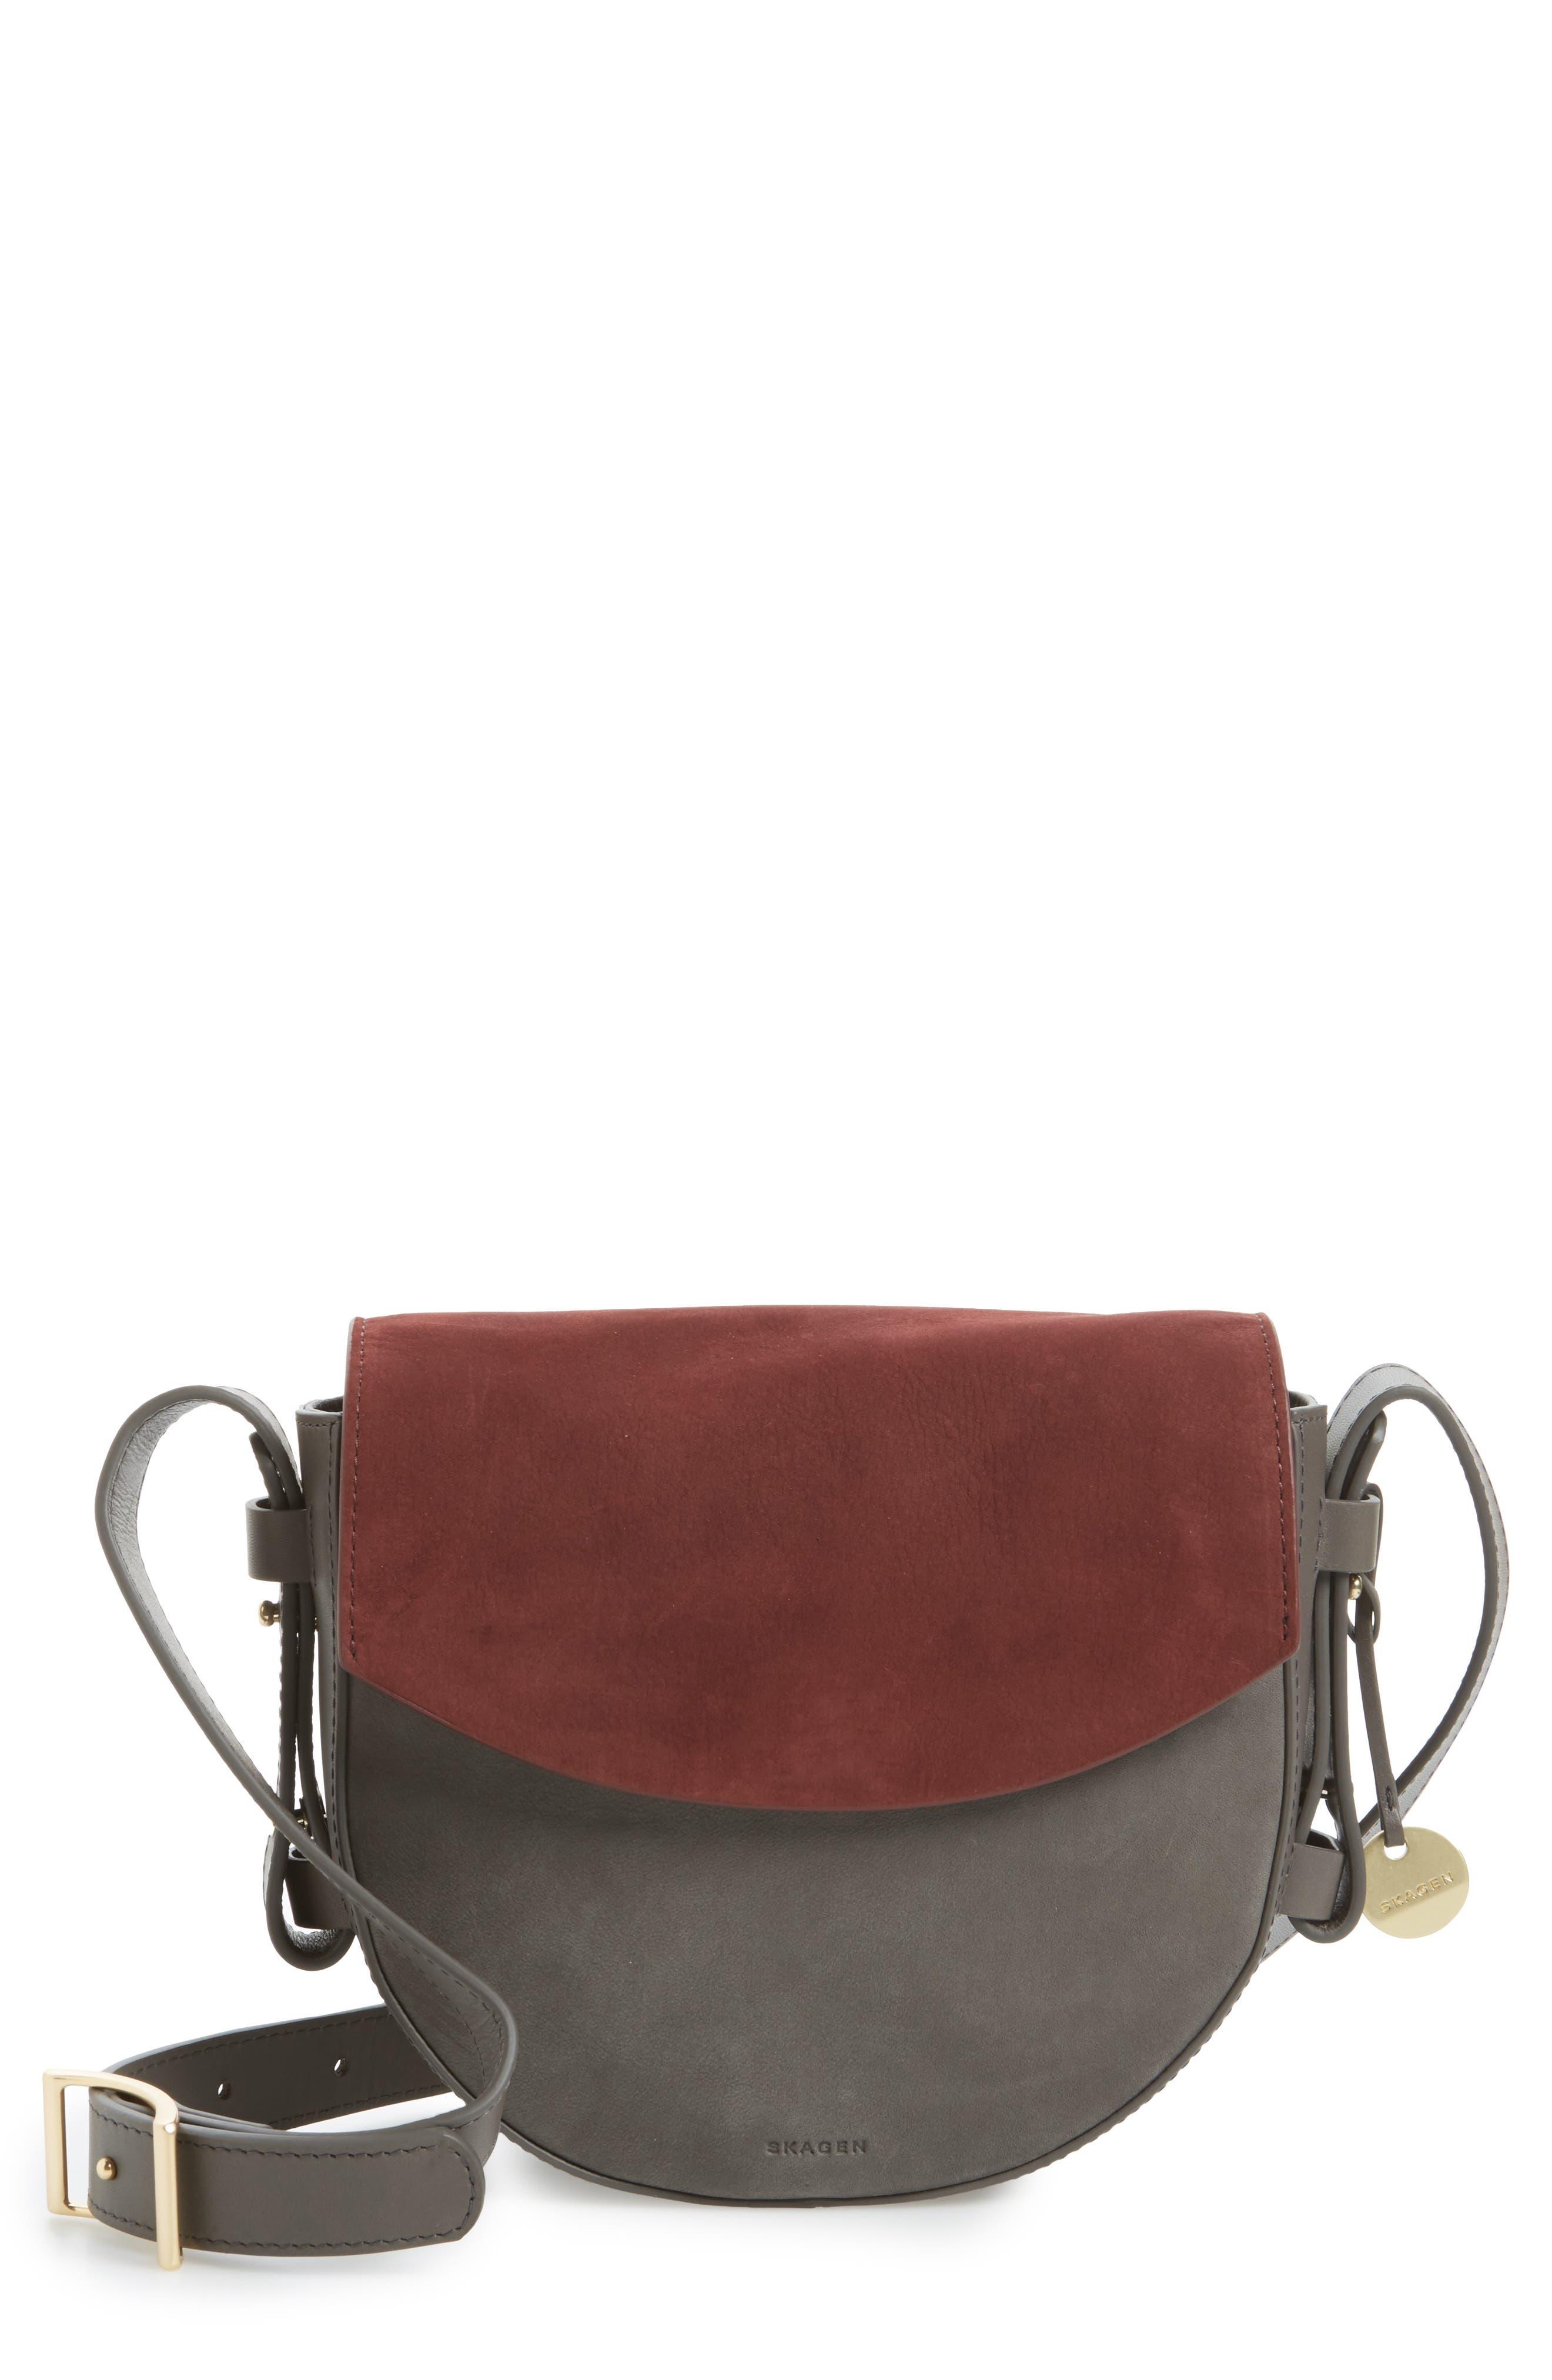 Lobelle Leather Saddle Bag,                             Main thumbnail 1, color,                             Pewter